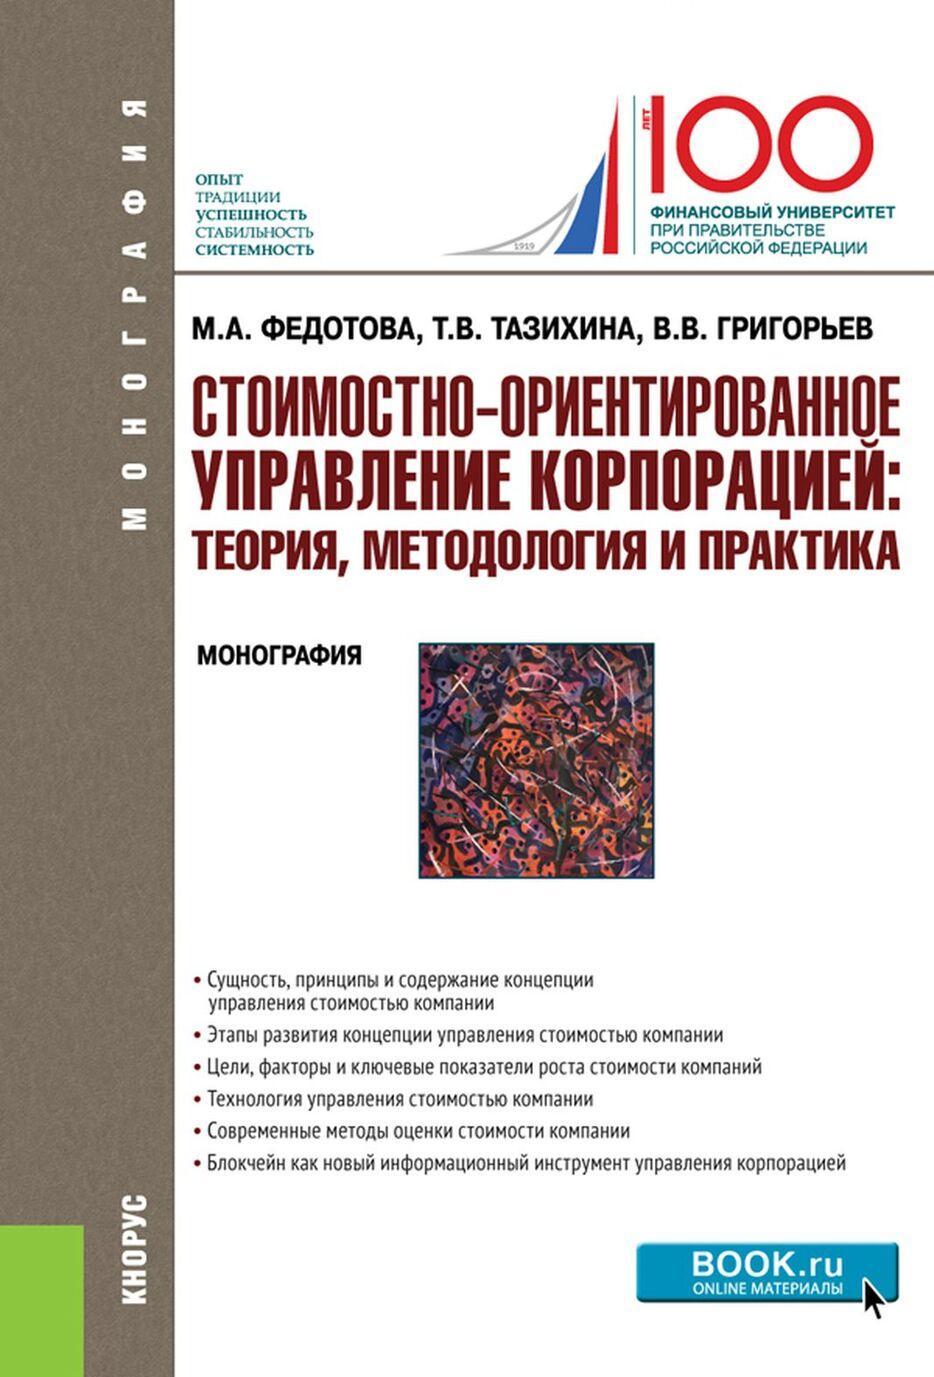 Stoimostno-orientirovanie upravlenie korporatsiej: teorija, metodologija i praktika. Monografija   Fedotova Marina Alekseevna, Tazikhina Tatjana Viktorovna